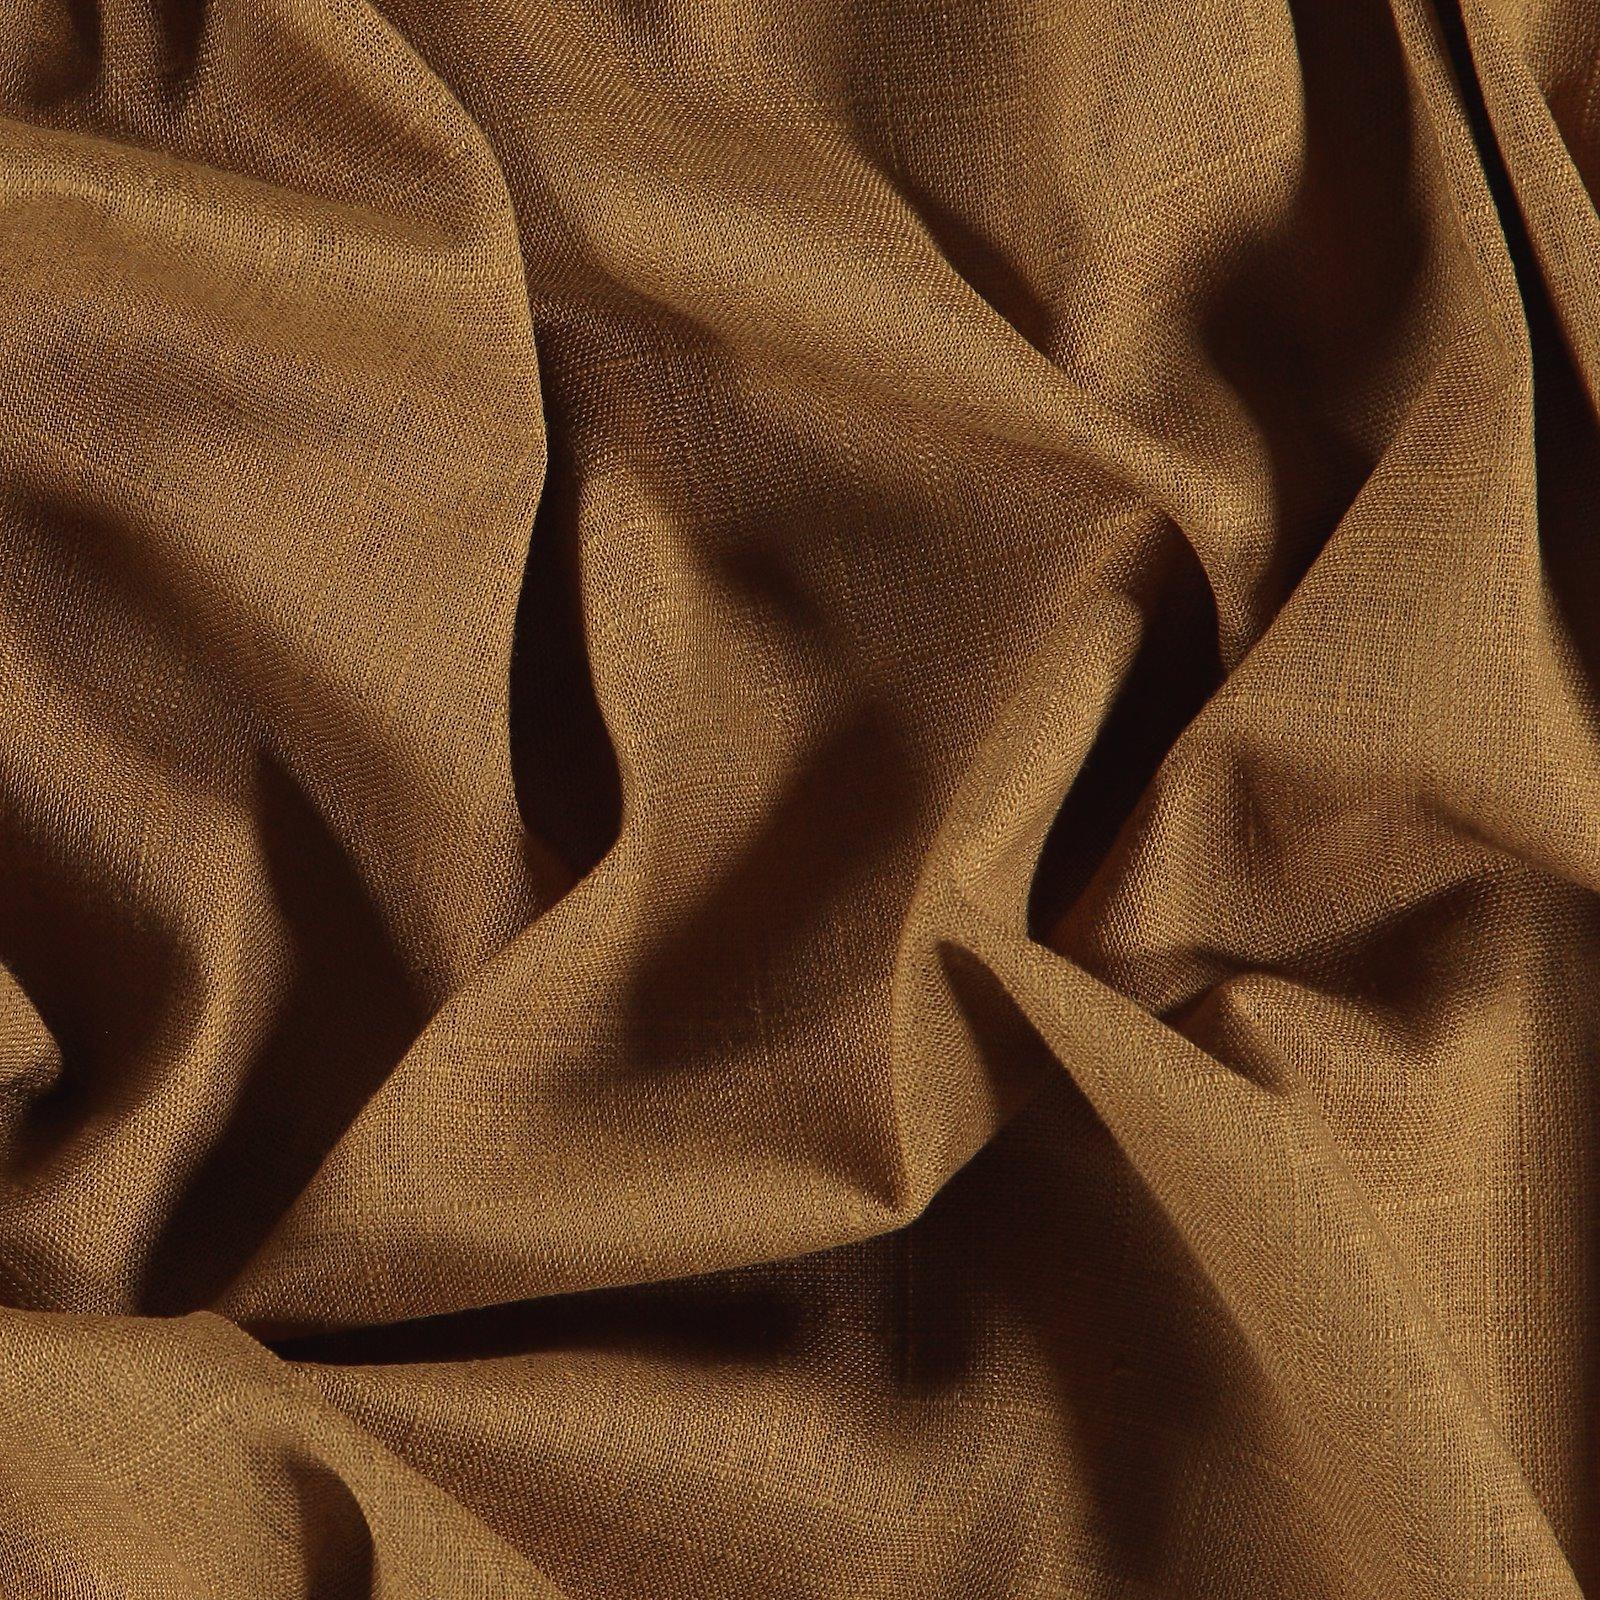 Coarse linen/viscose light caramel 852332_pack